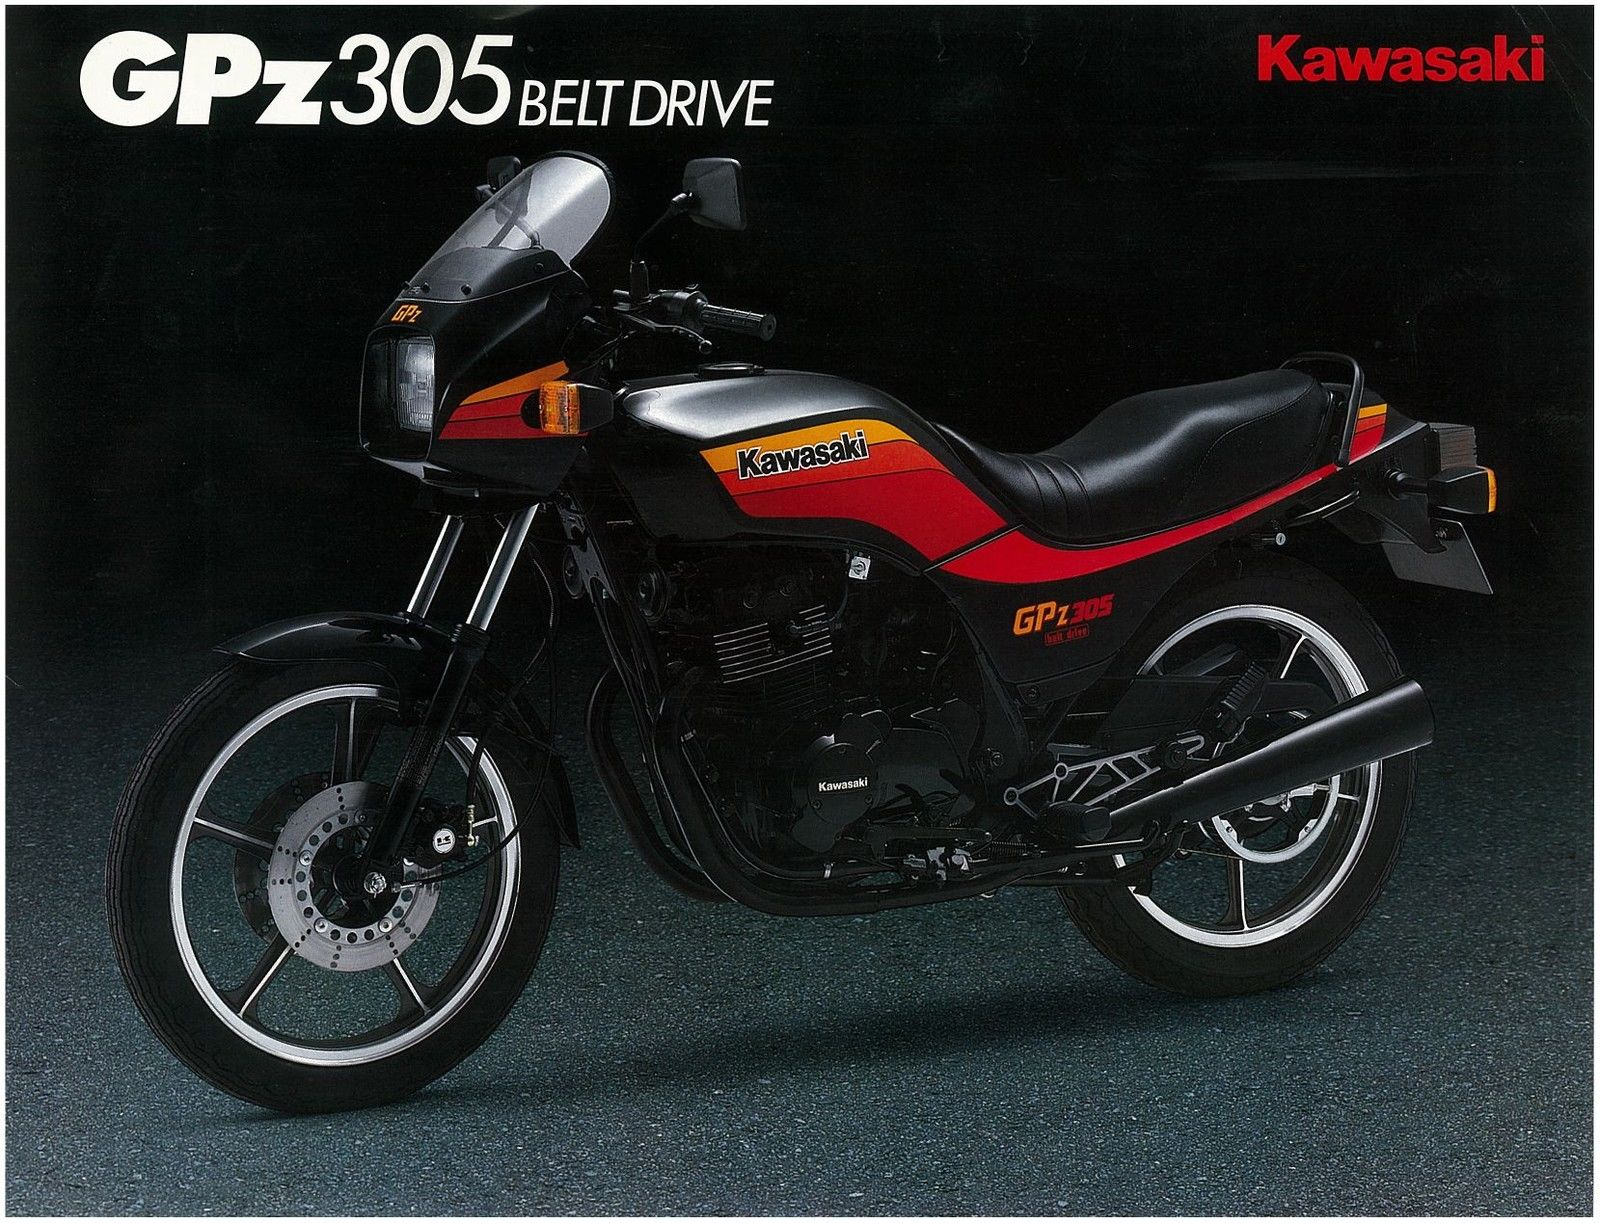 gpz305.jpg